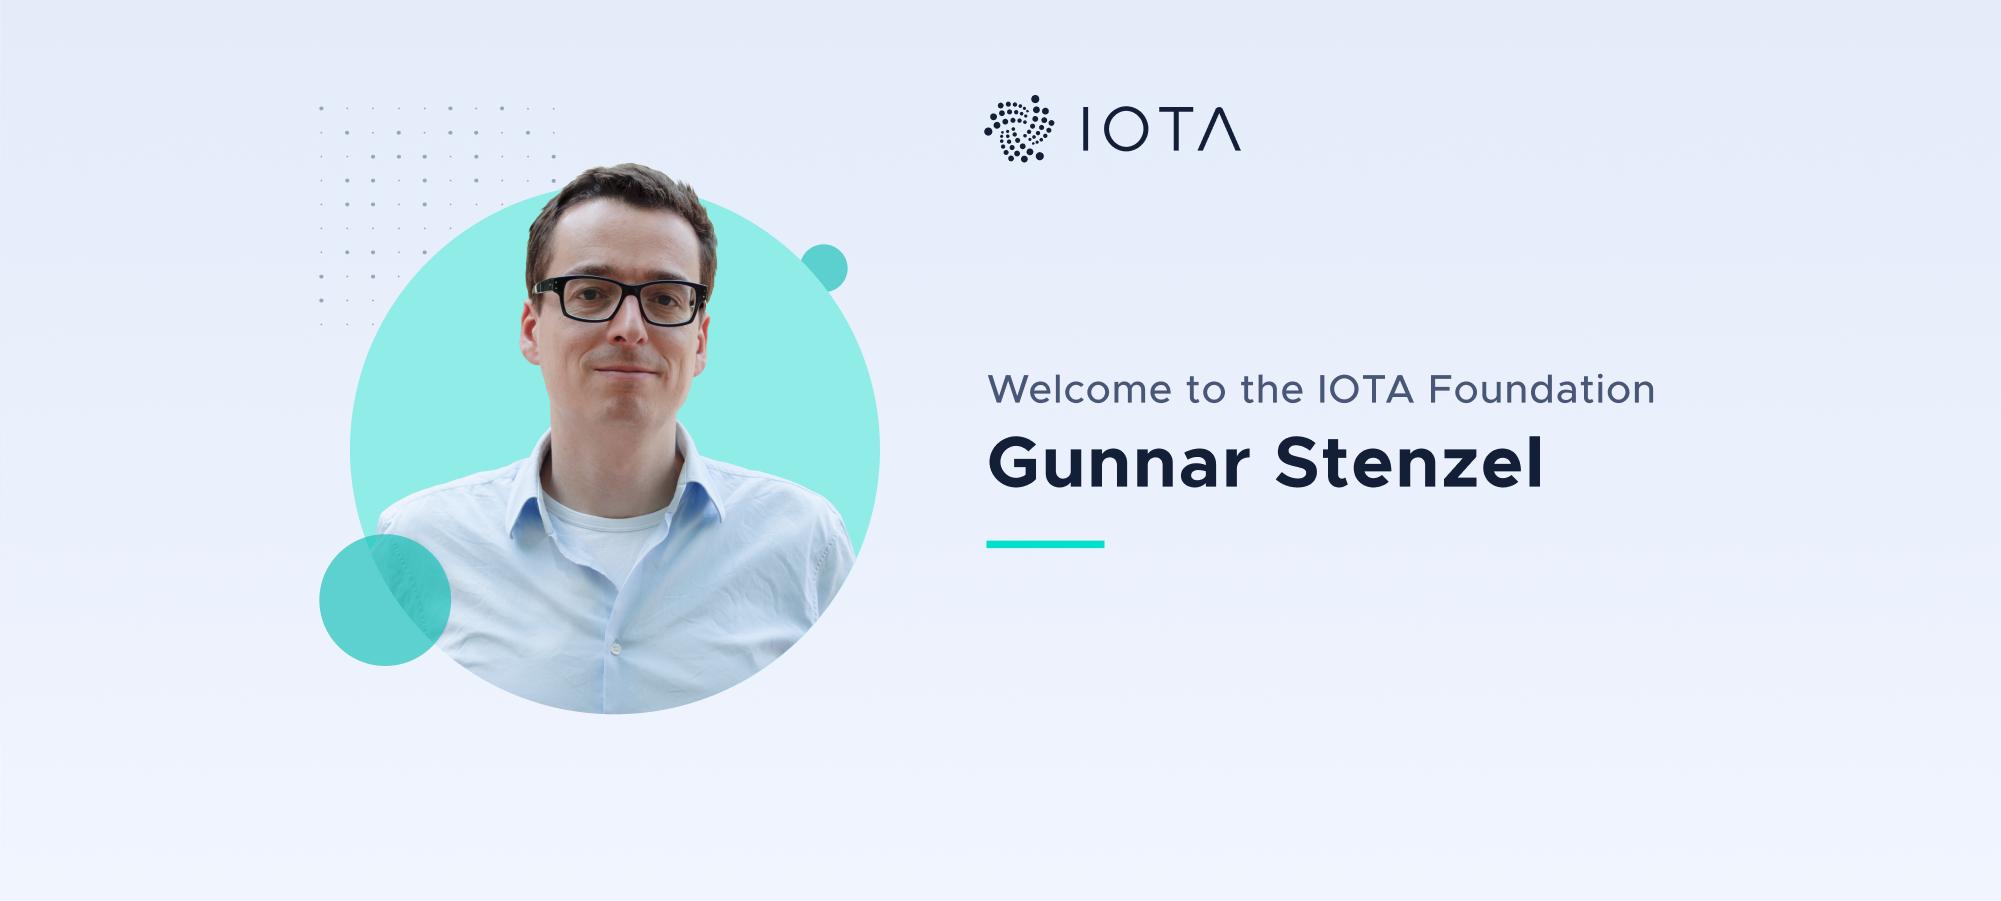 Welcome Gunnar Stenzel to the IOTA Foundation